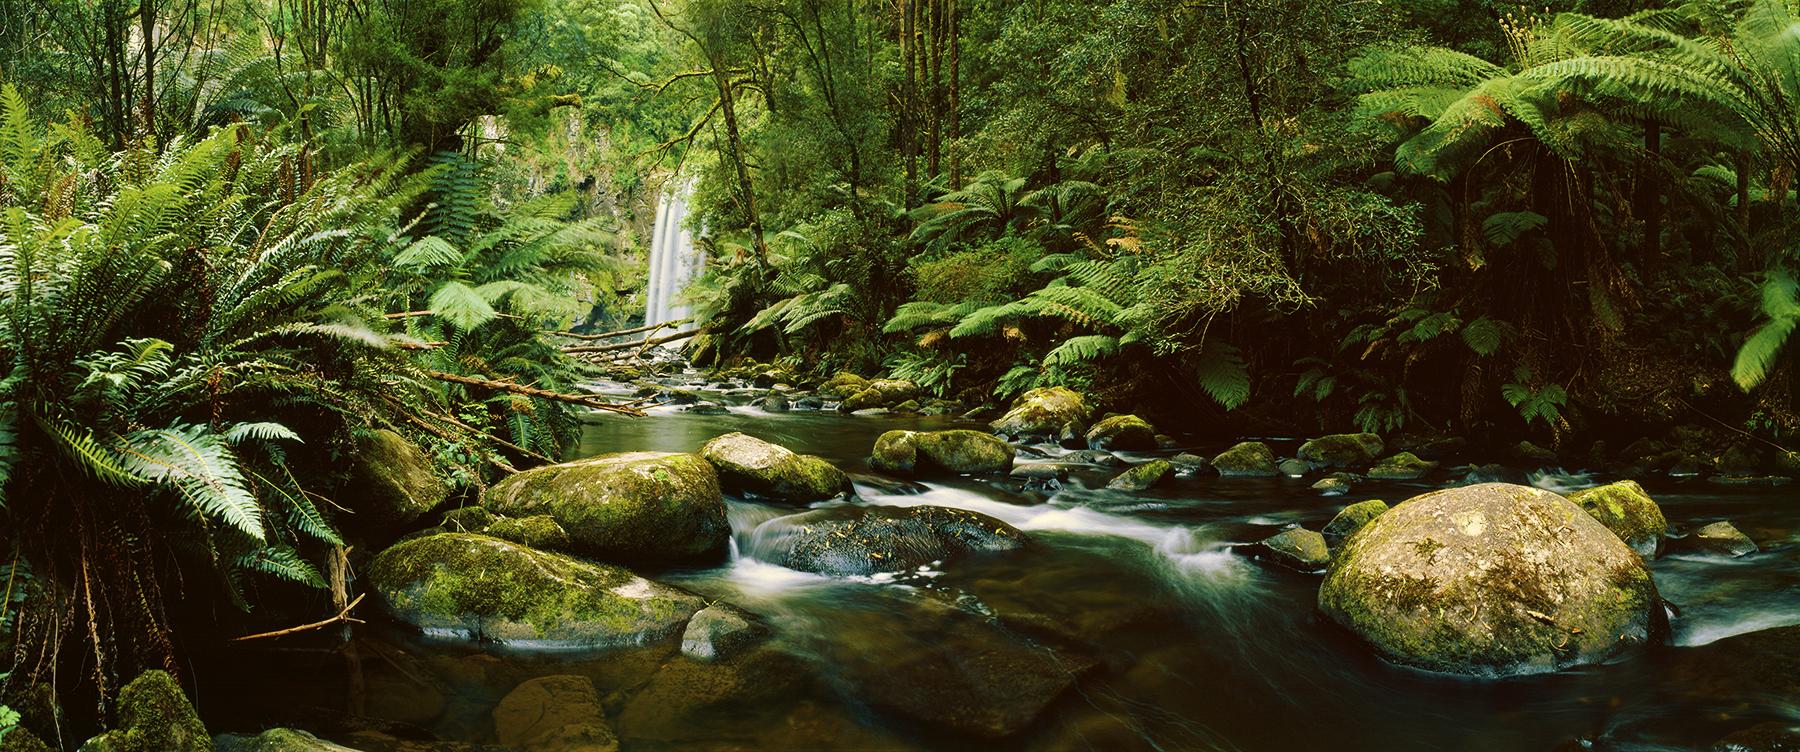 Hopetoun Falls, Victoria, Australia. A Limited Edition Fine Art Landscape Photograph by Richard Hume